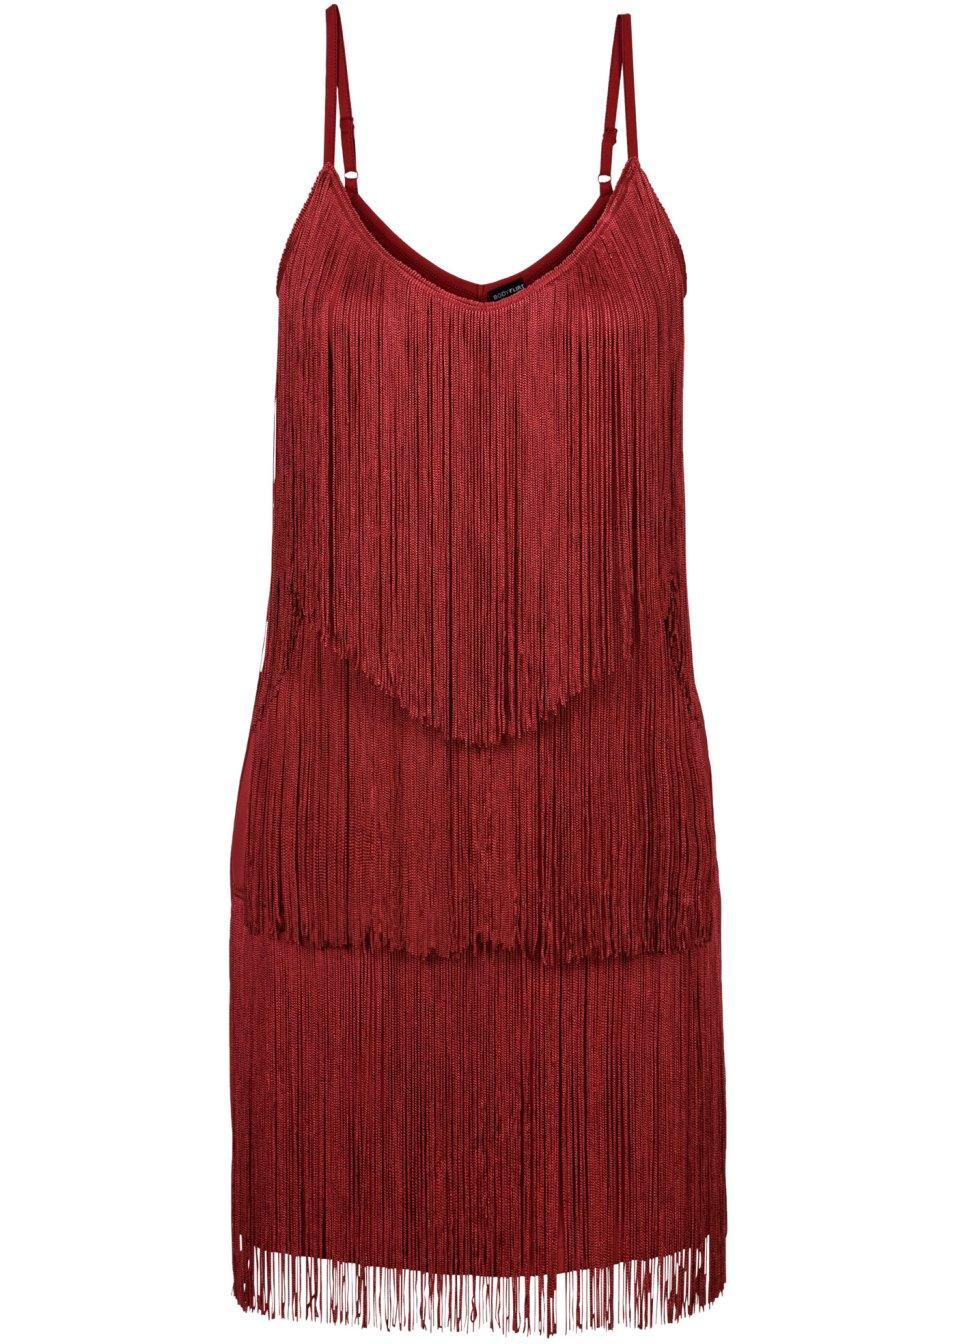 extravagantes spaghettitr ger kleid mit fransen rotbraun. Black Bedroom Furniture Sets. Home Design Ideas